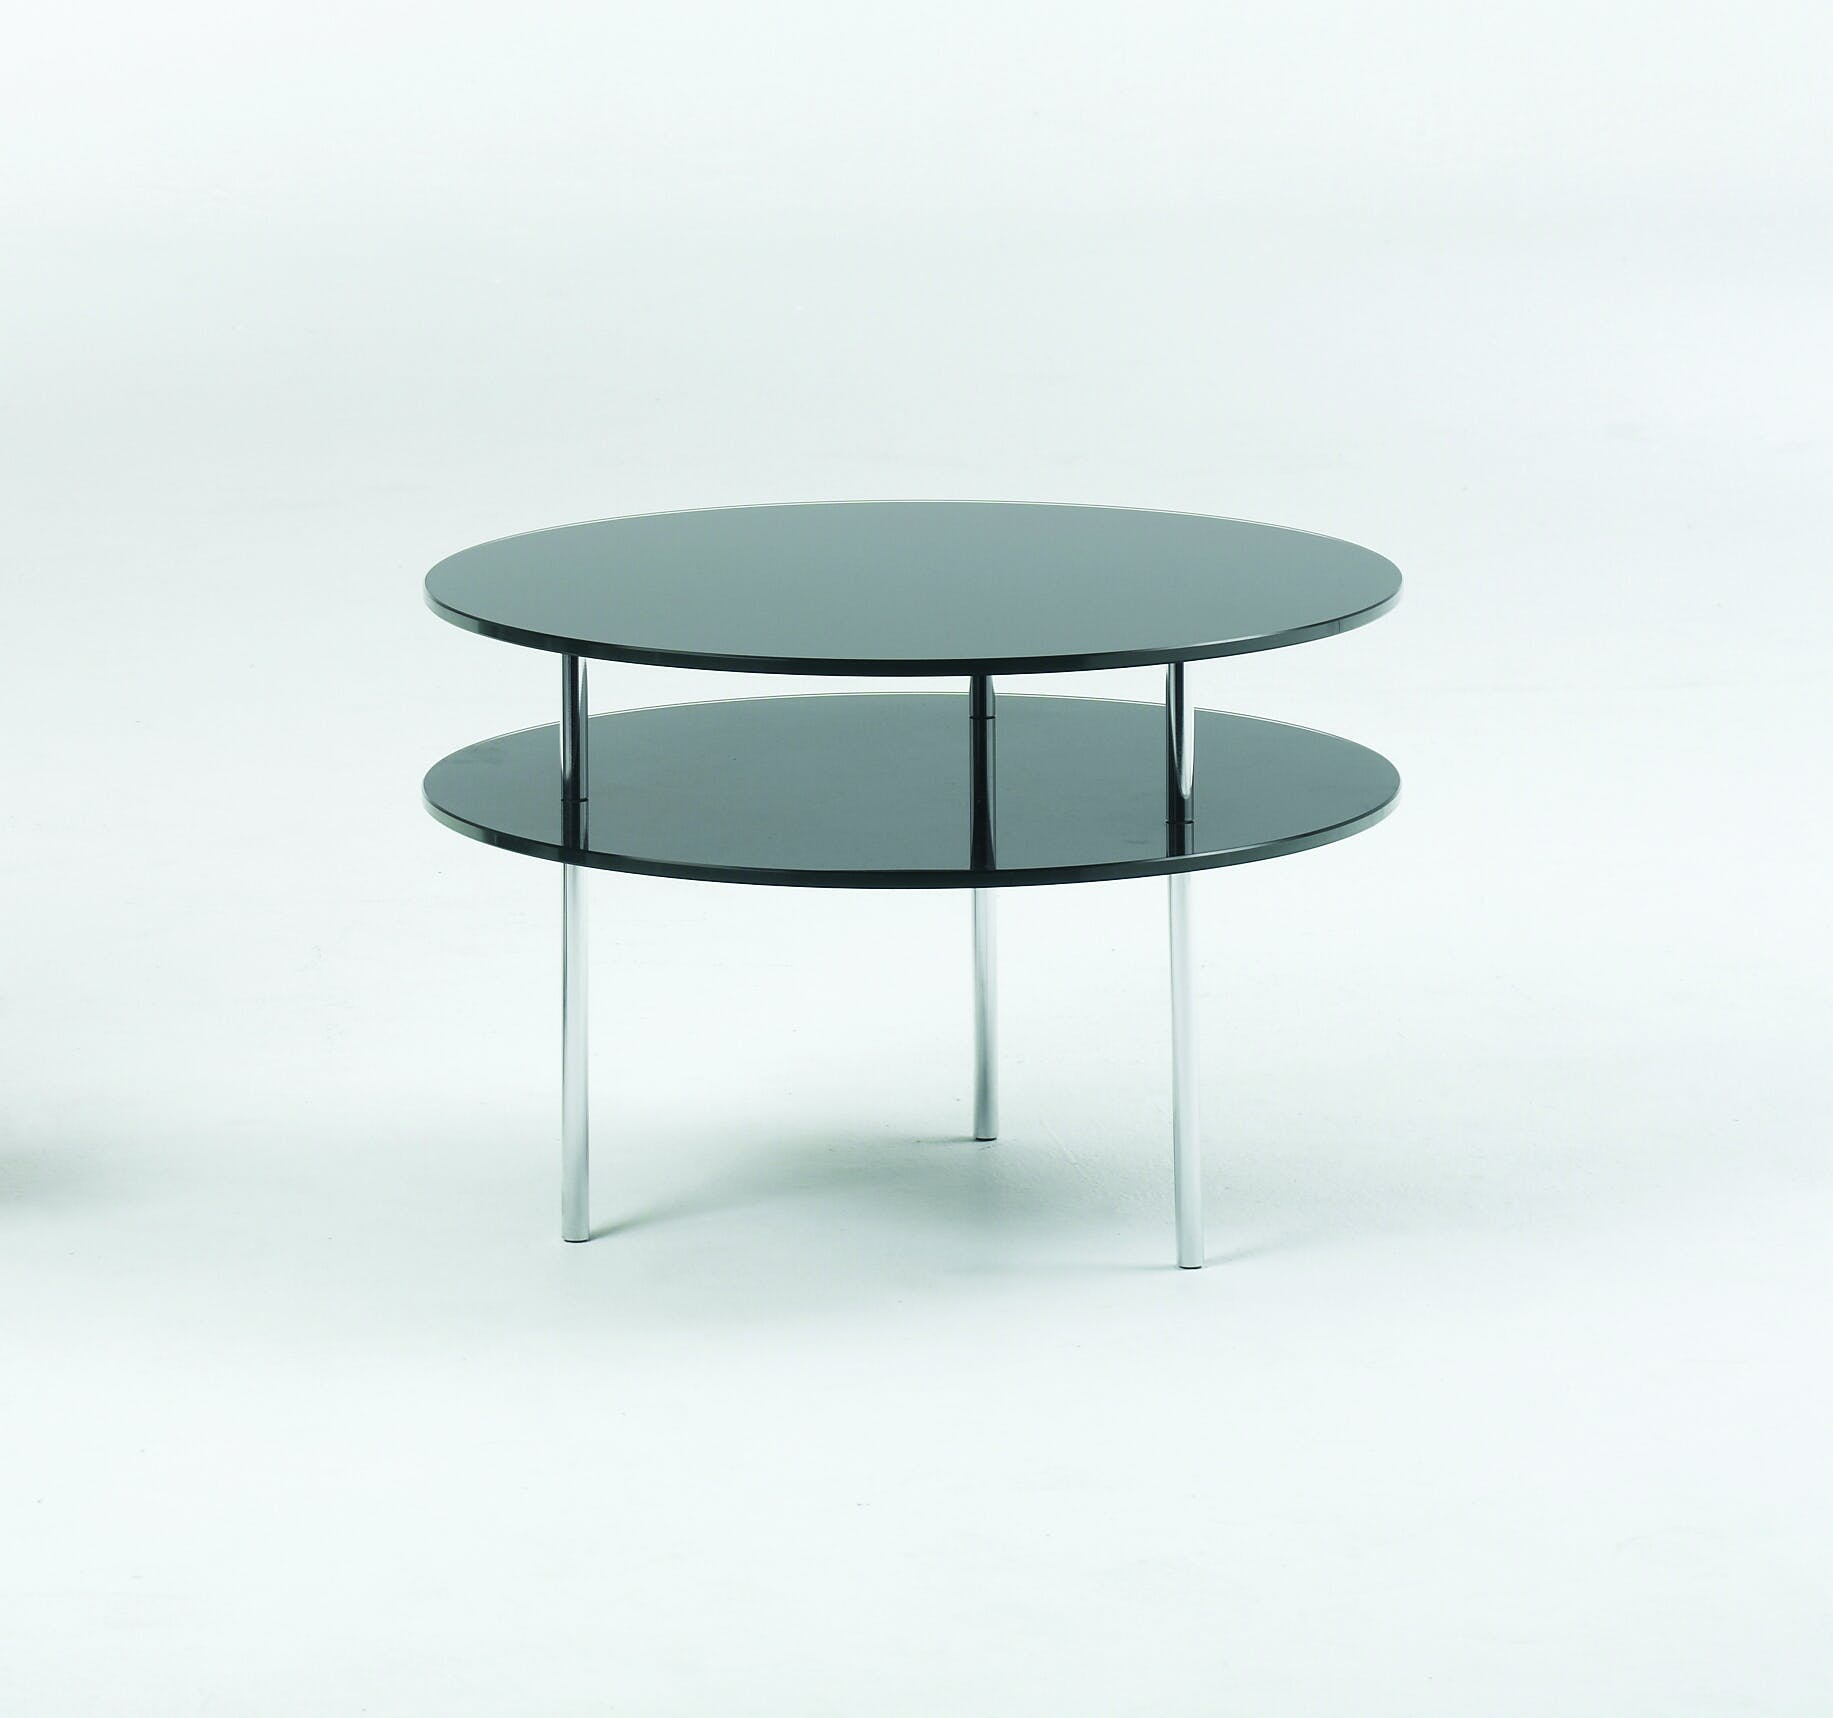 Scp-furniture-sax-side-table-dark-glass-haute-living